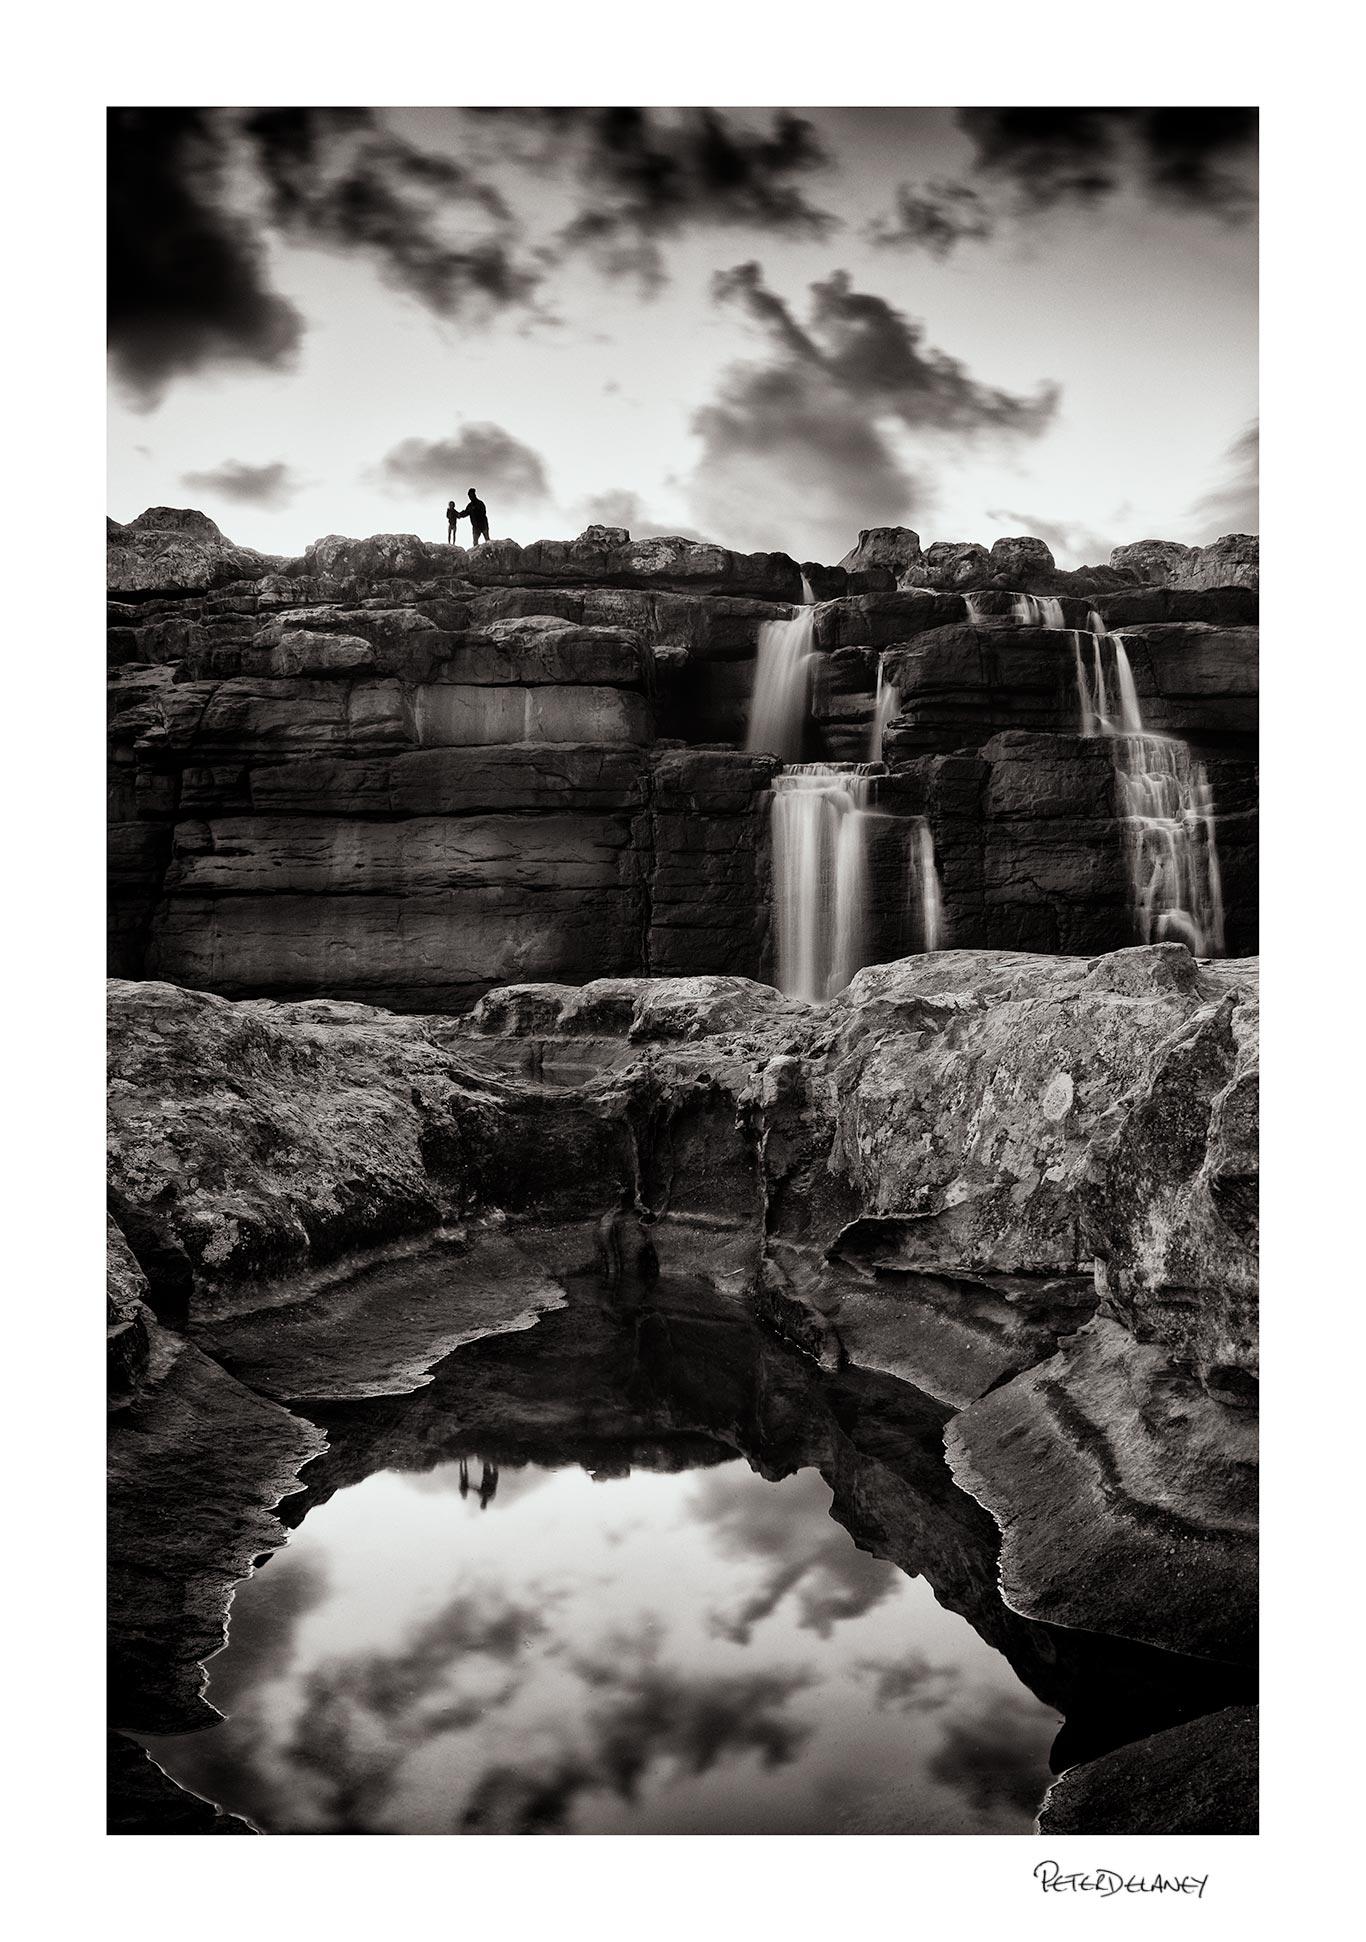 Mother and Child Waterfall Fine Art Print              FujiFilm XT-2, 18-55mm plus Lee Filter Big Stopper